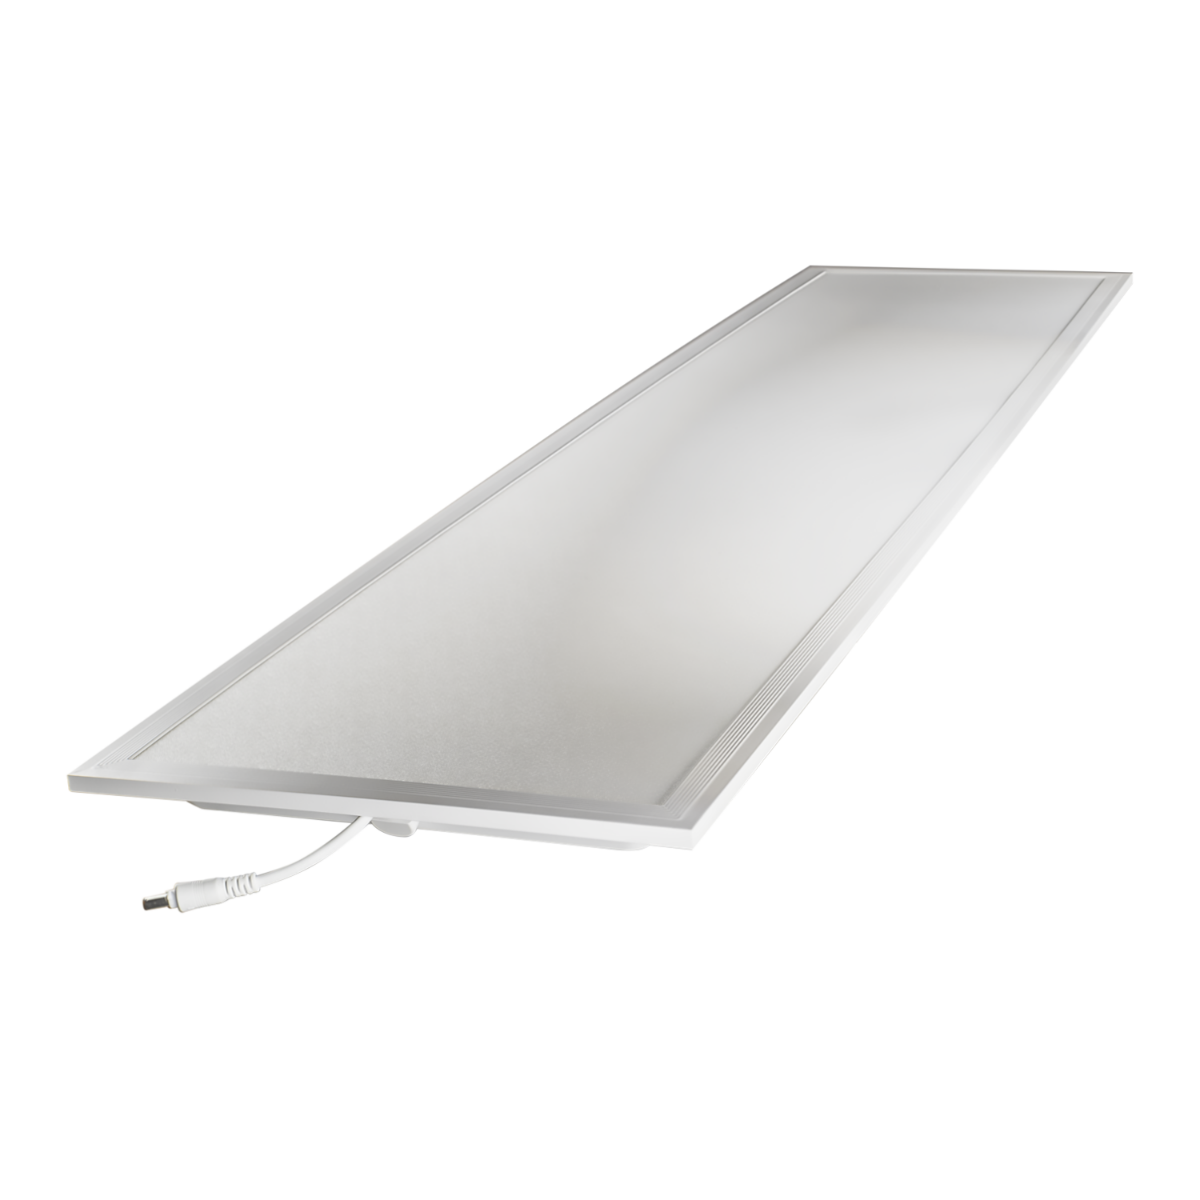 Noxion LED Panel Econox 32W Xitanium DALI 30x120cm 3000K 3900lm UGR <22 | Dali Dimmable - Replacer for 2x36W